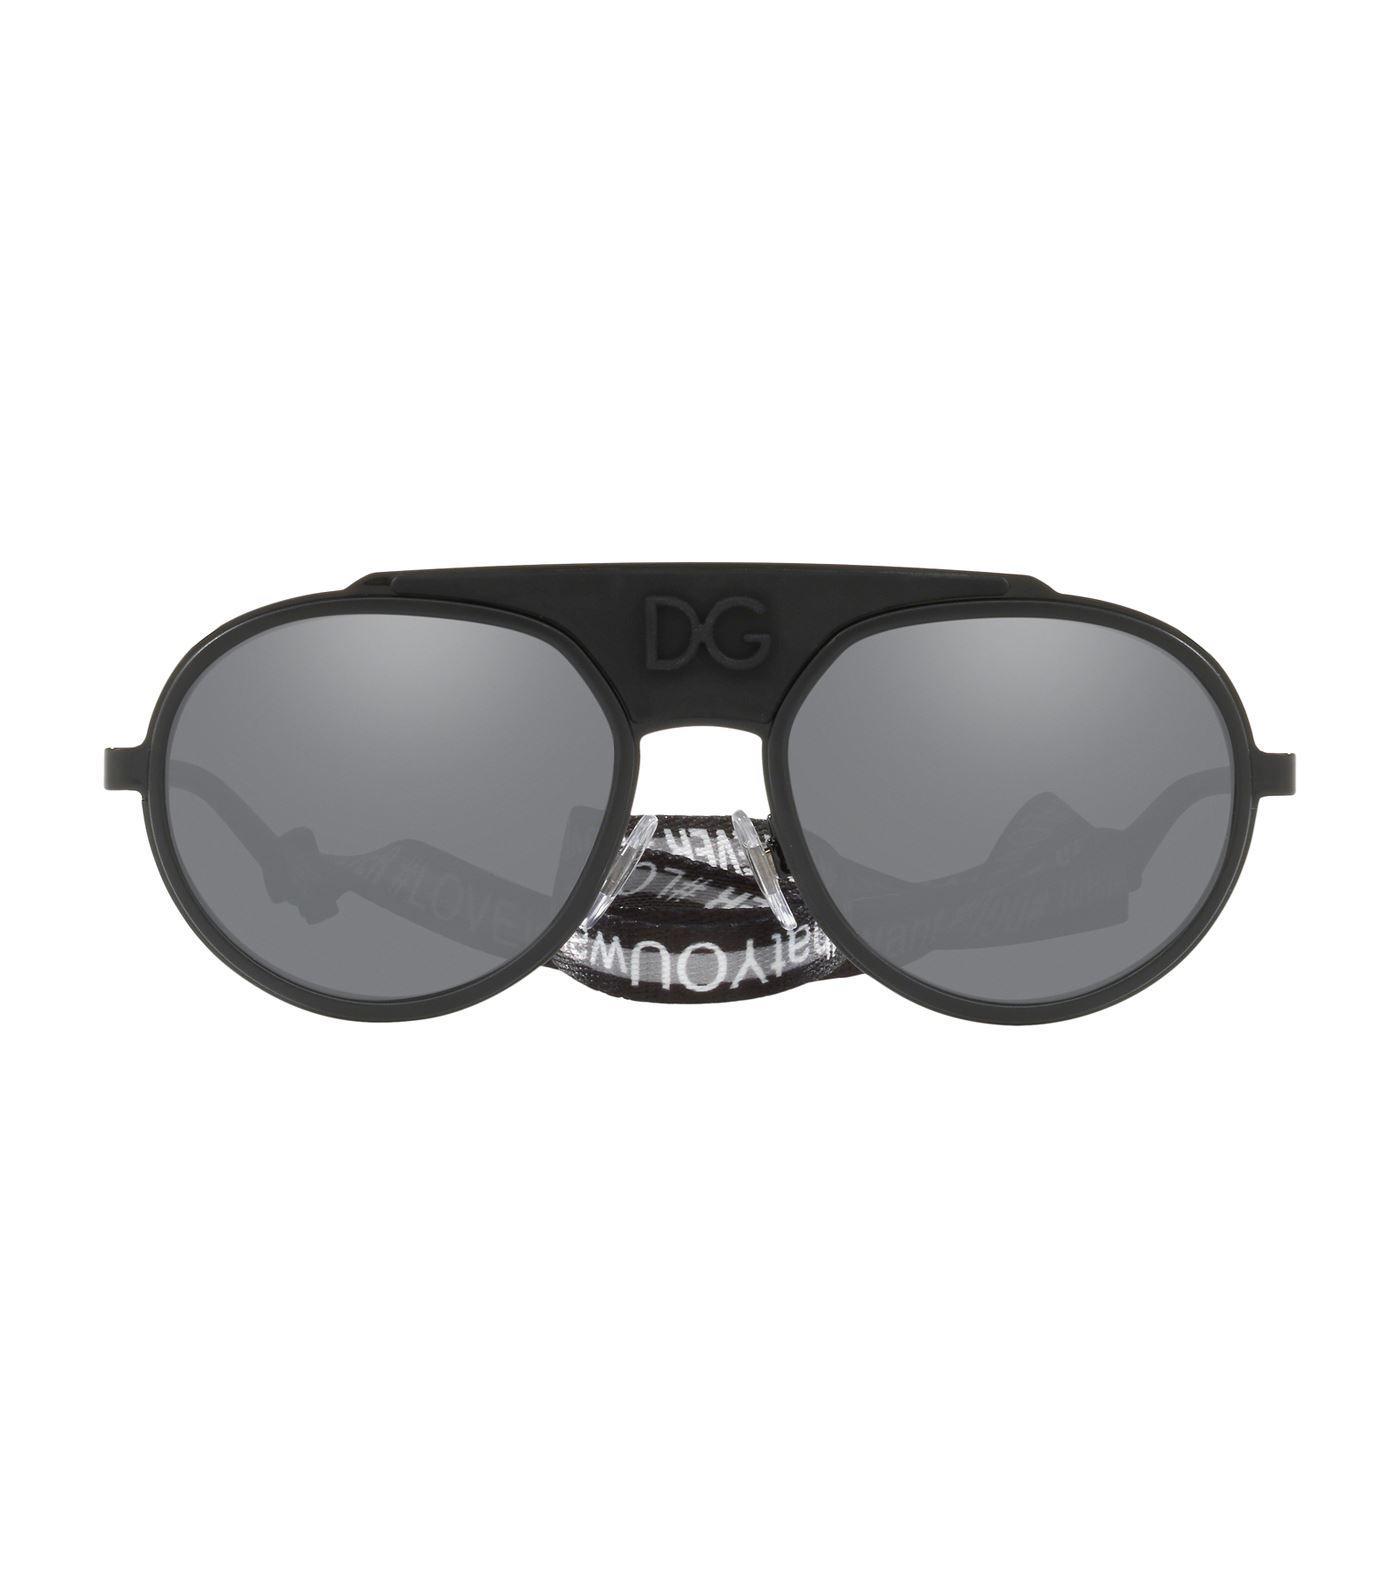 206694fe16b Lyst - Dolce   Gabbana Phantos Goggle Sunglasses in Black for Men